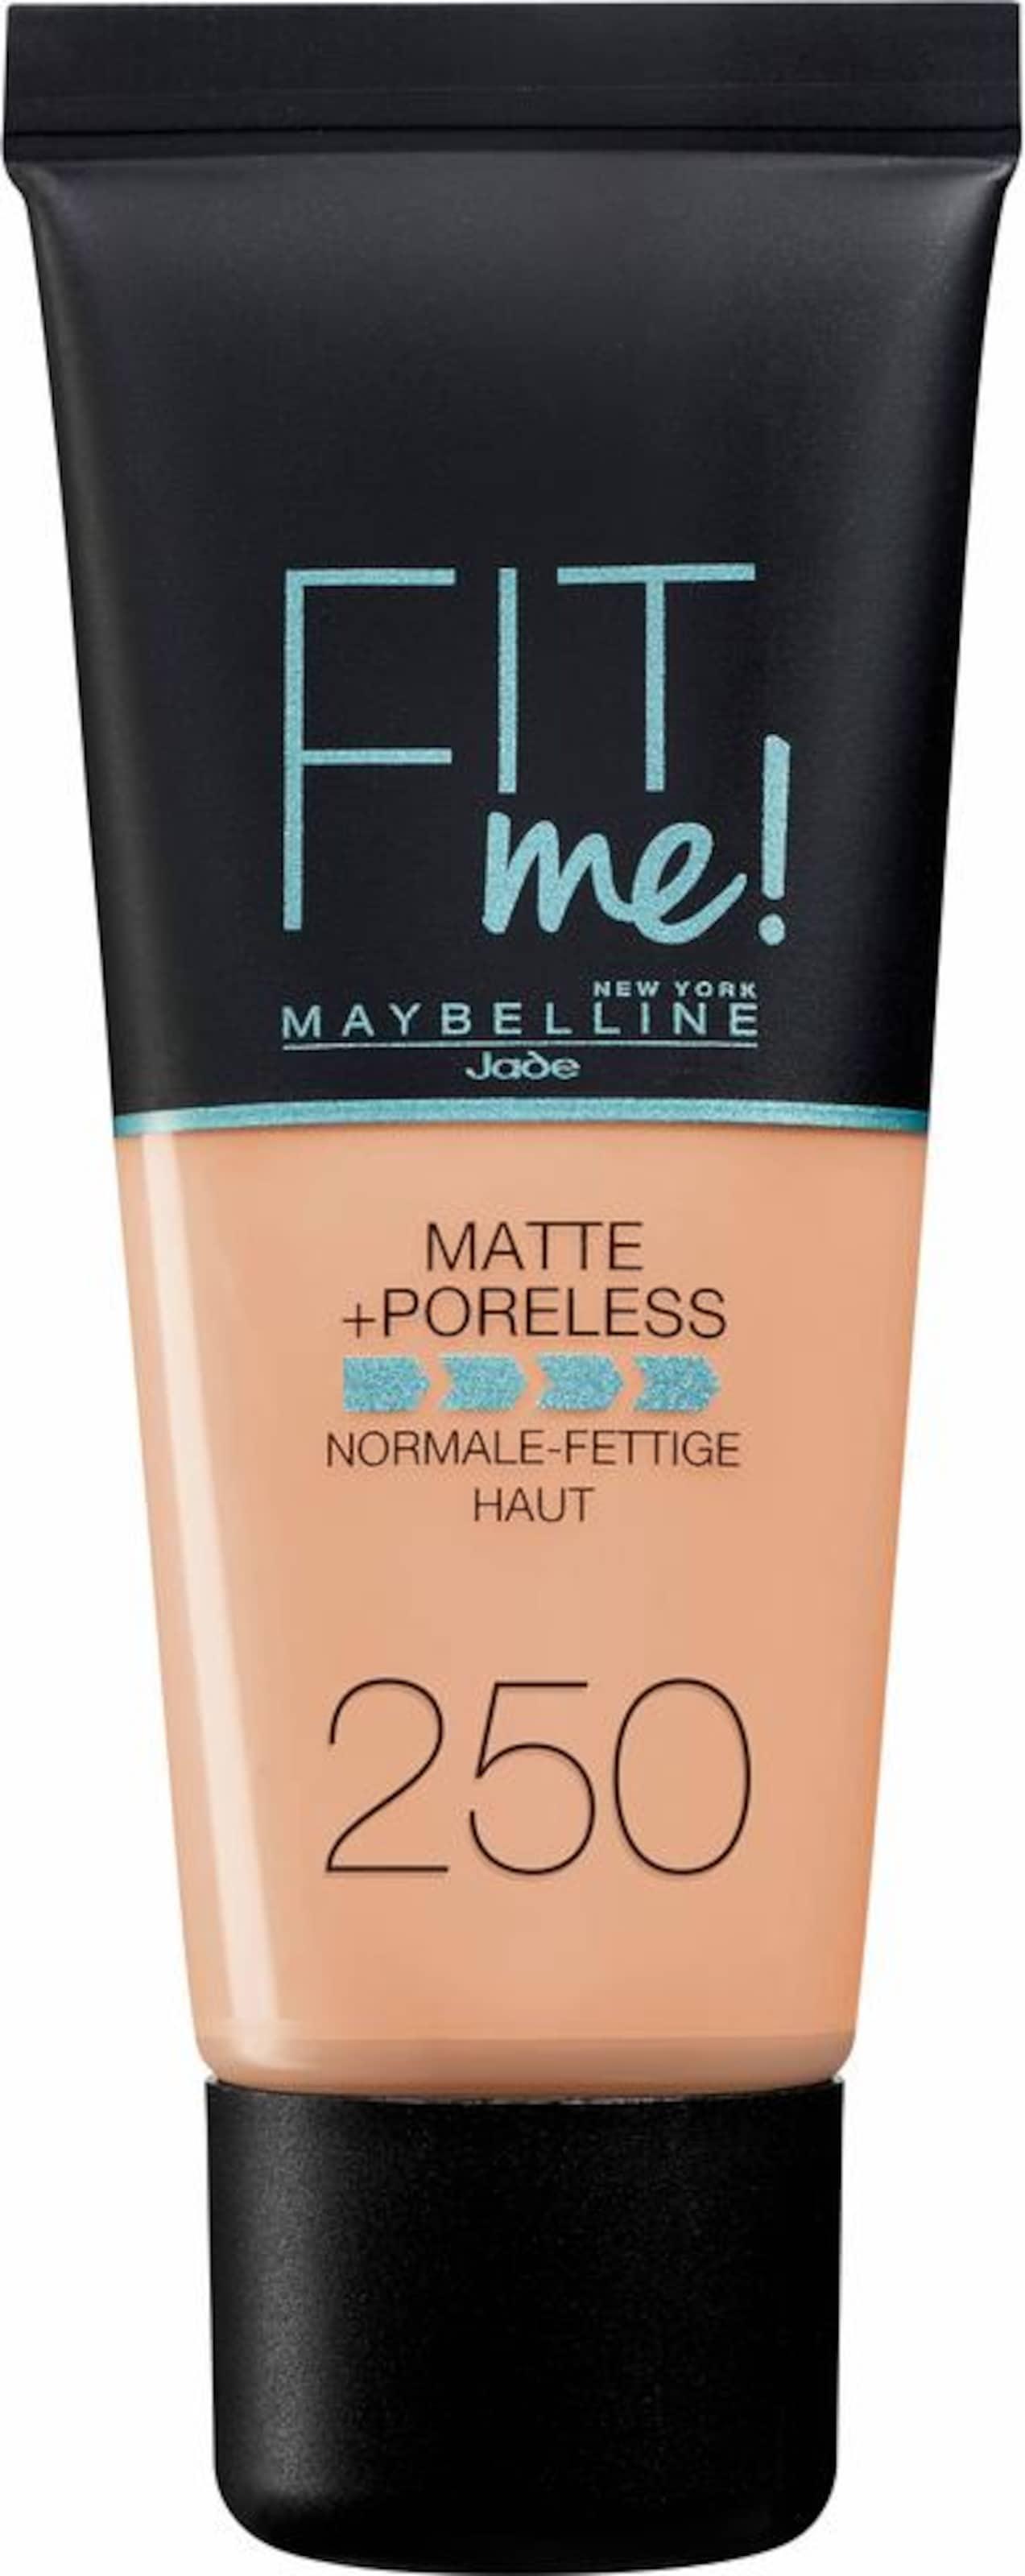 MAYBELLINE New York 'FIT ME Matt&Poreless Make-Up', Make-Up